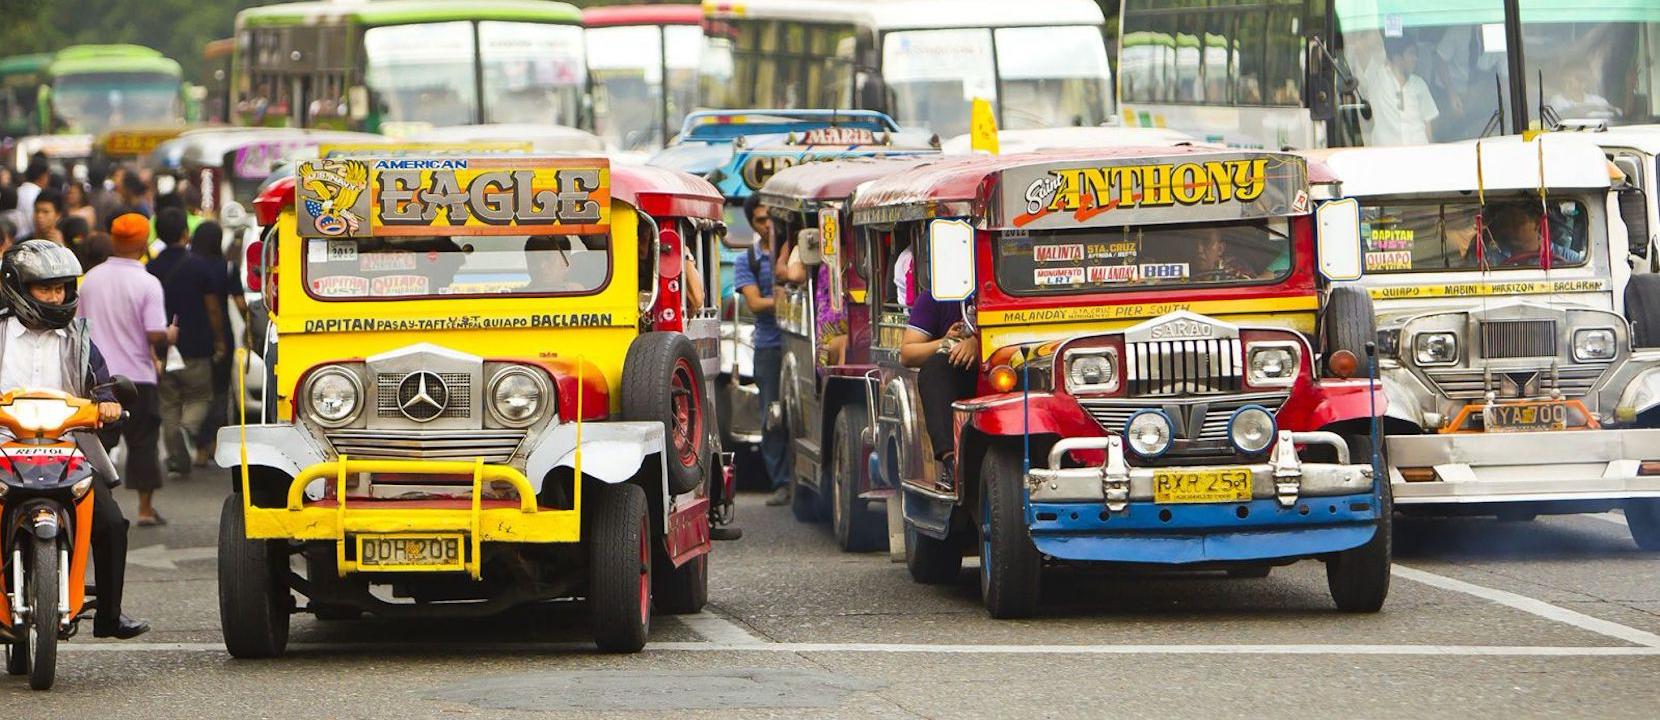 8 days Manila and Bohol tour ( Private tour )